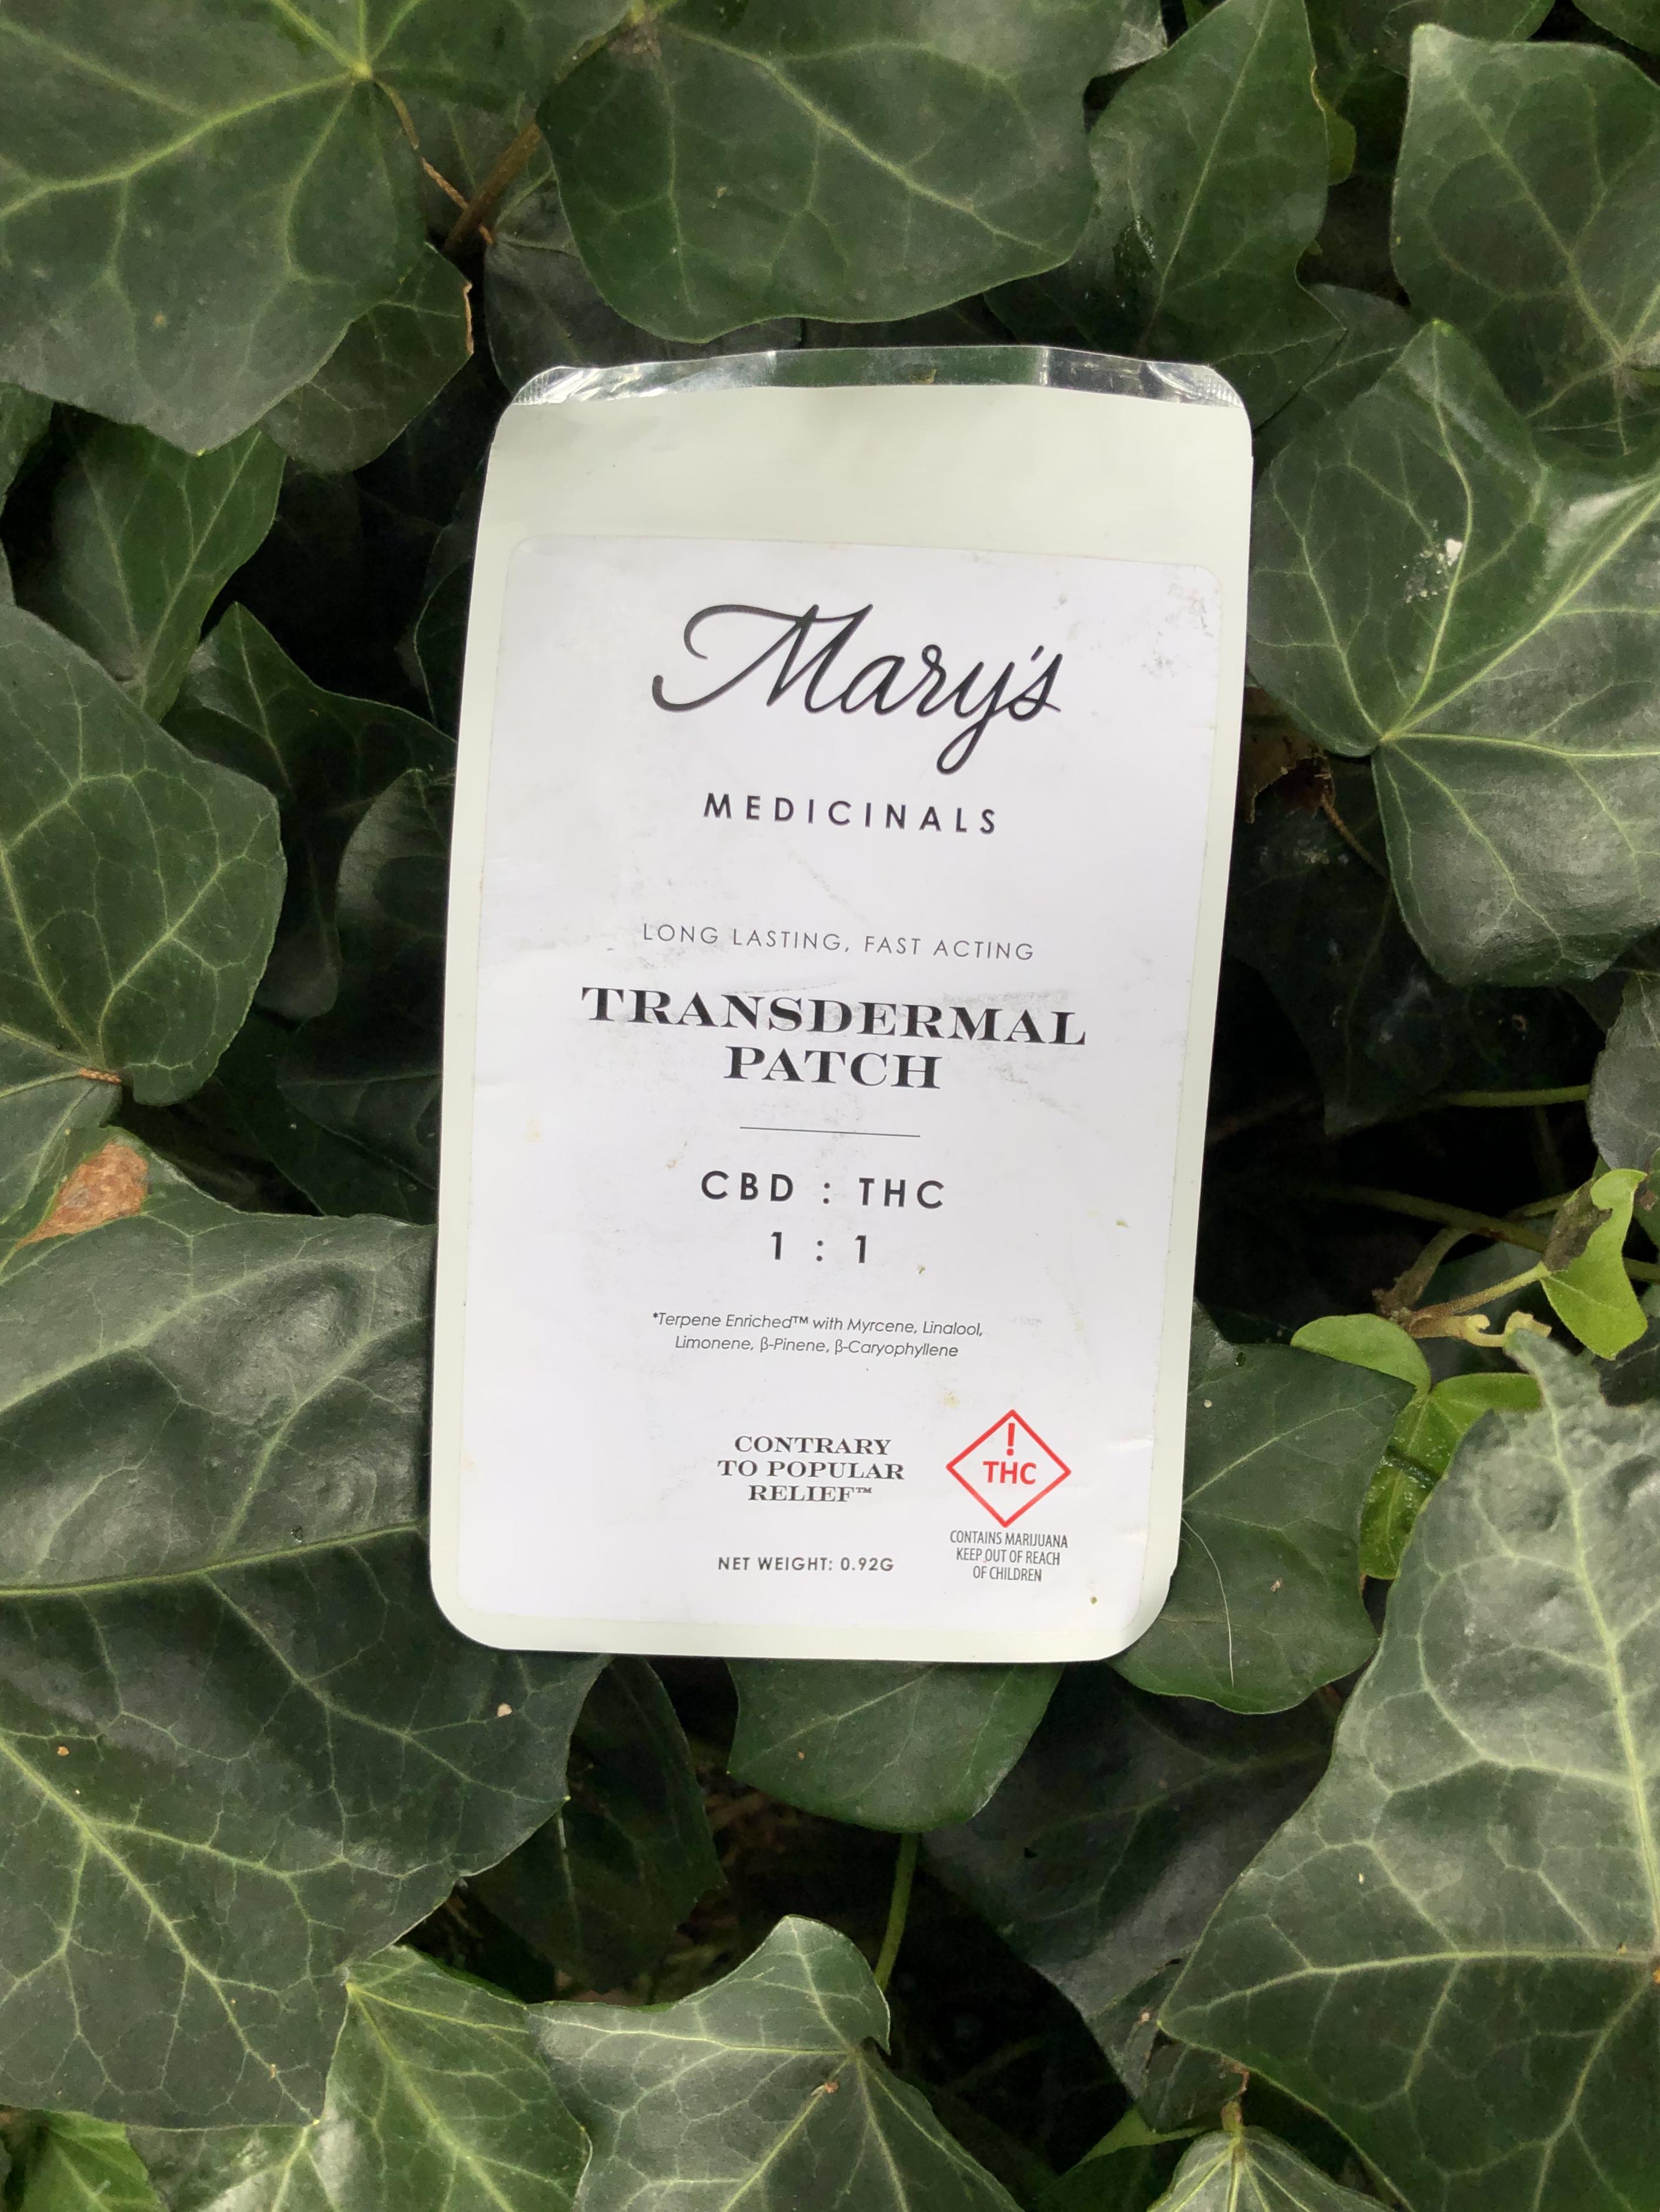 Mary's Medicinals Transdermal Patch